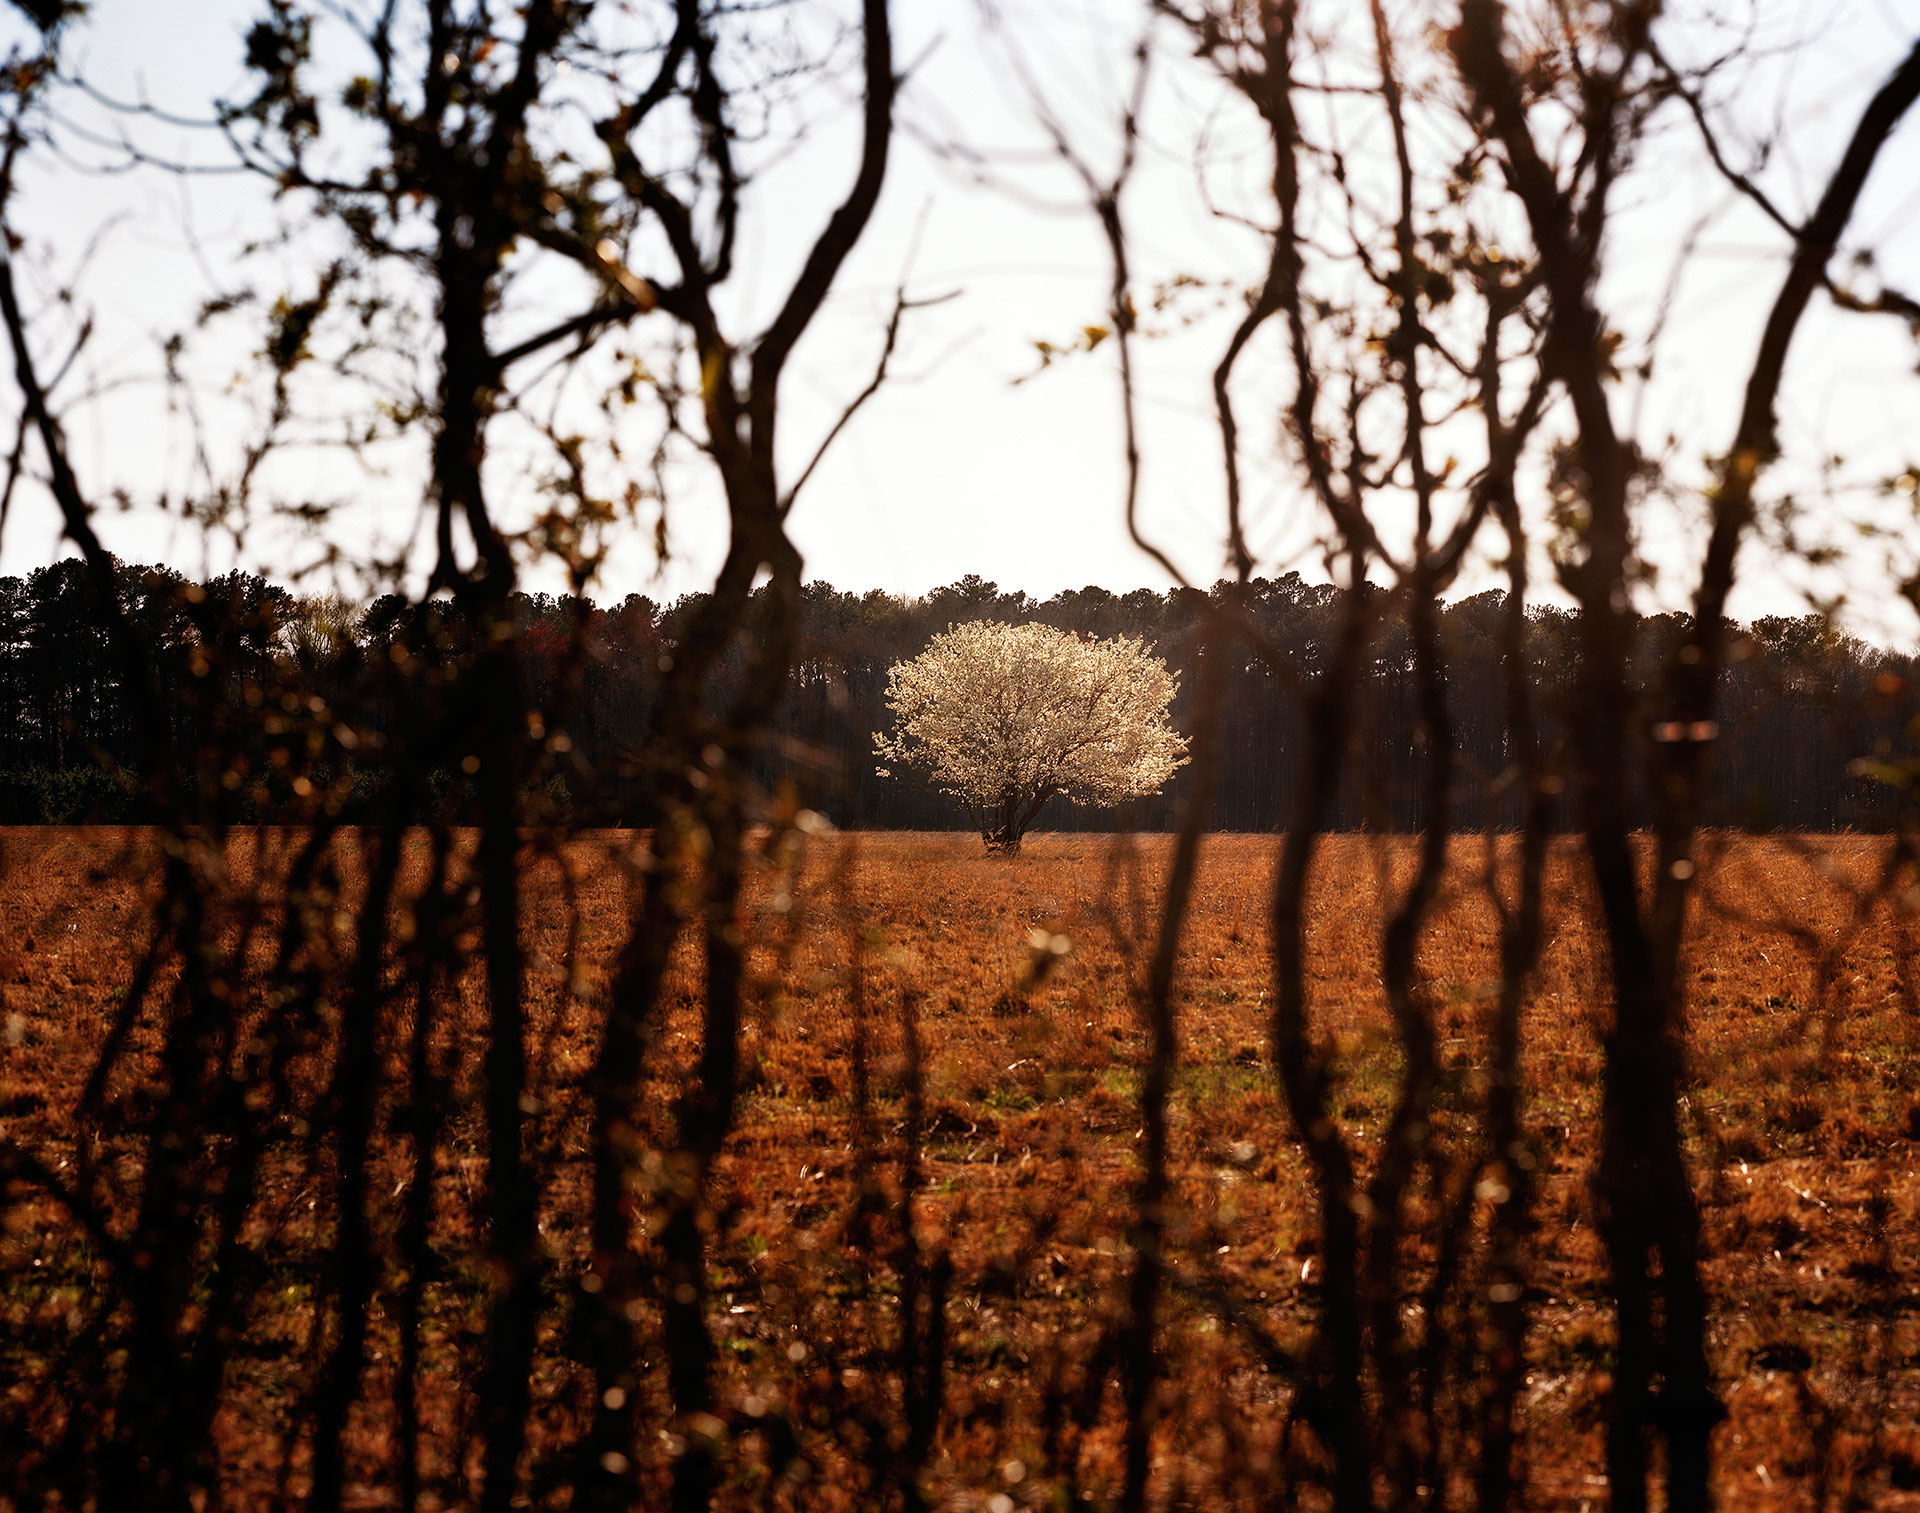 Sacred Space, Muckenfus Road